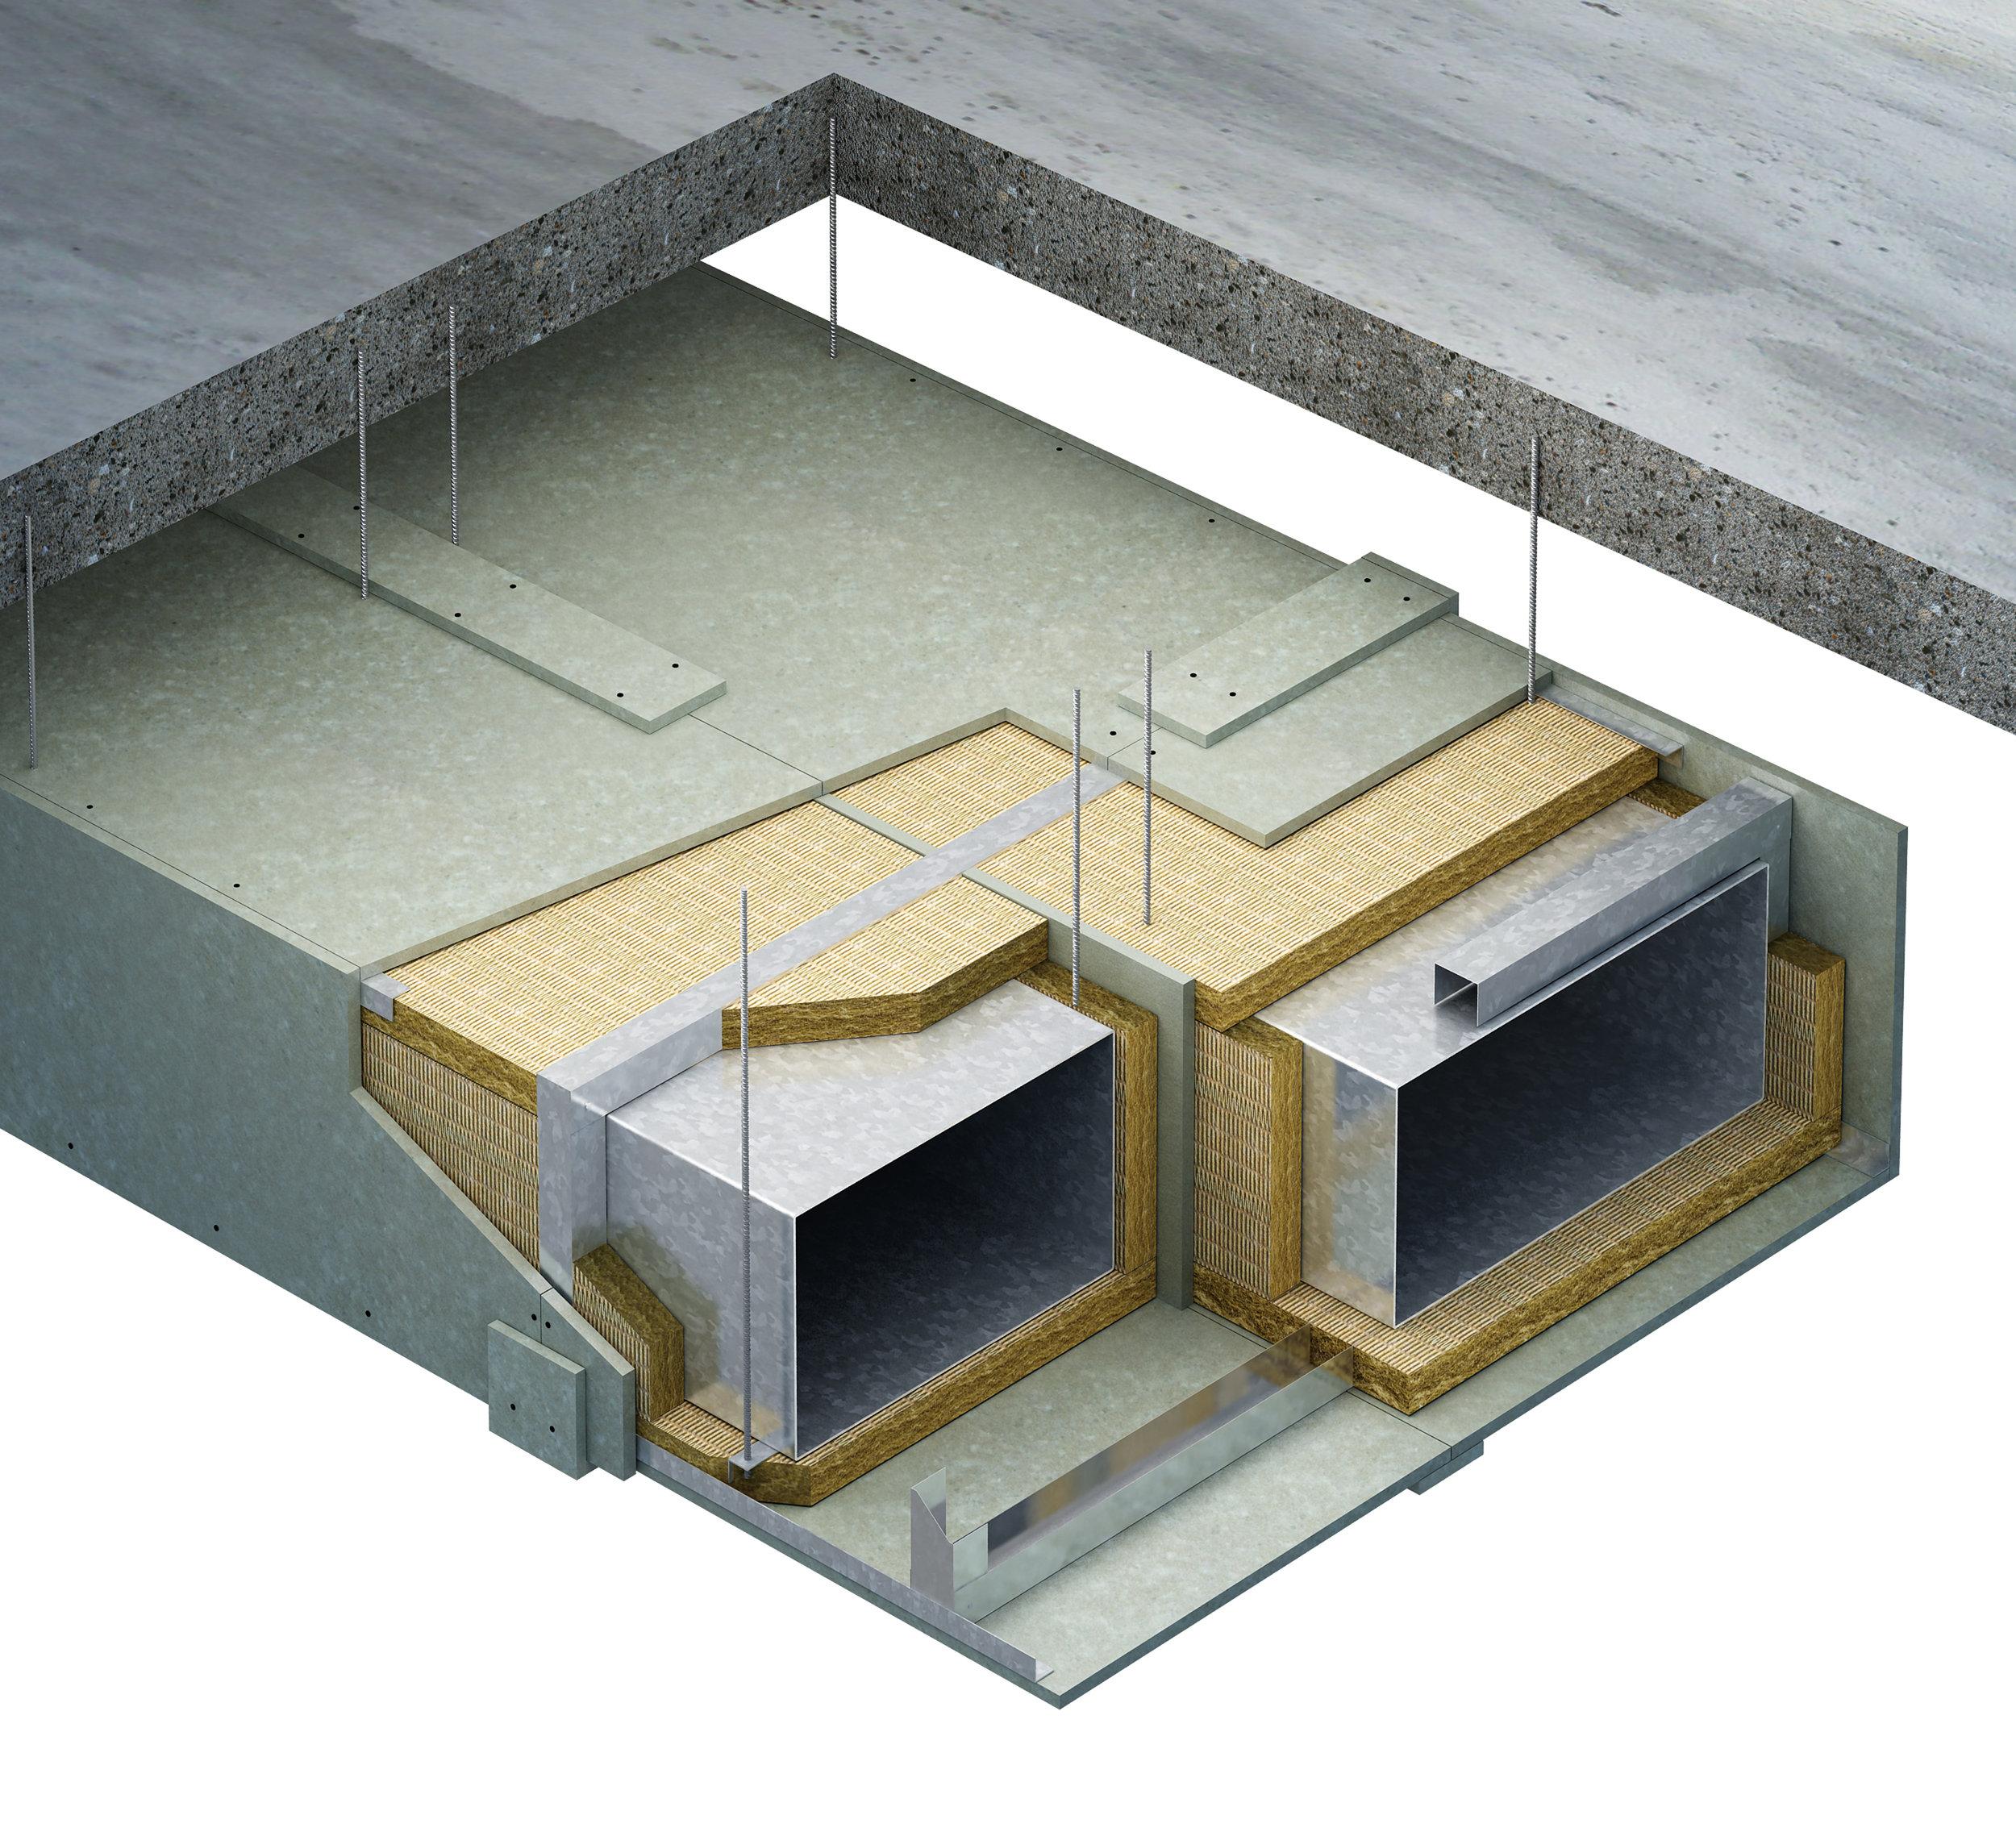 Ventilation+Duct-06_3500.jpg